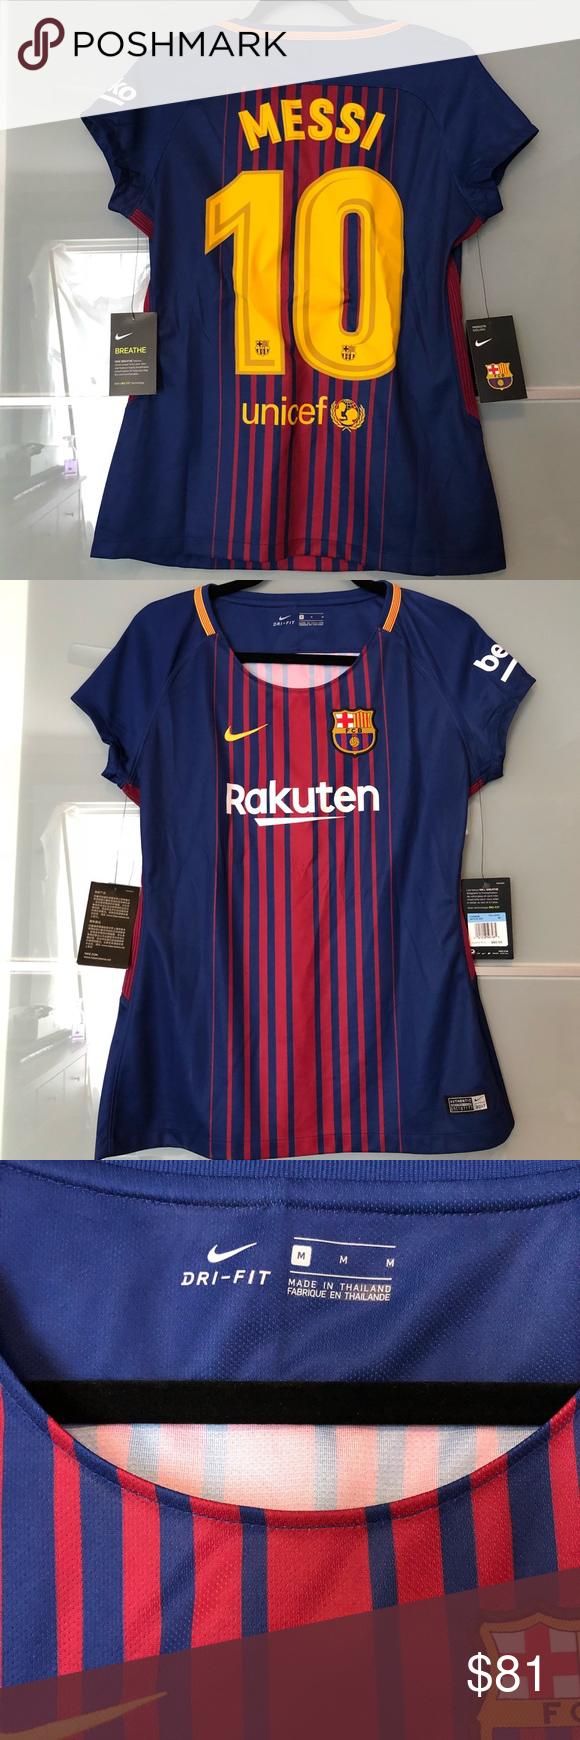 buy popular 332e9 d66a0 Nike Barcelona Messi Jersey 2017-2018 — Women's M Customized ...